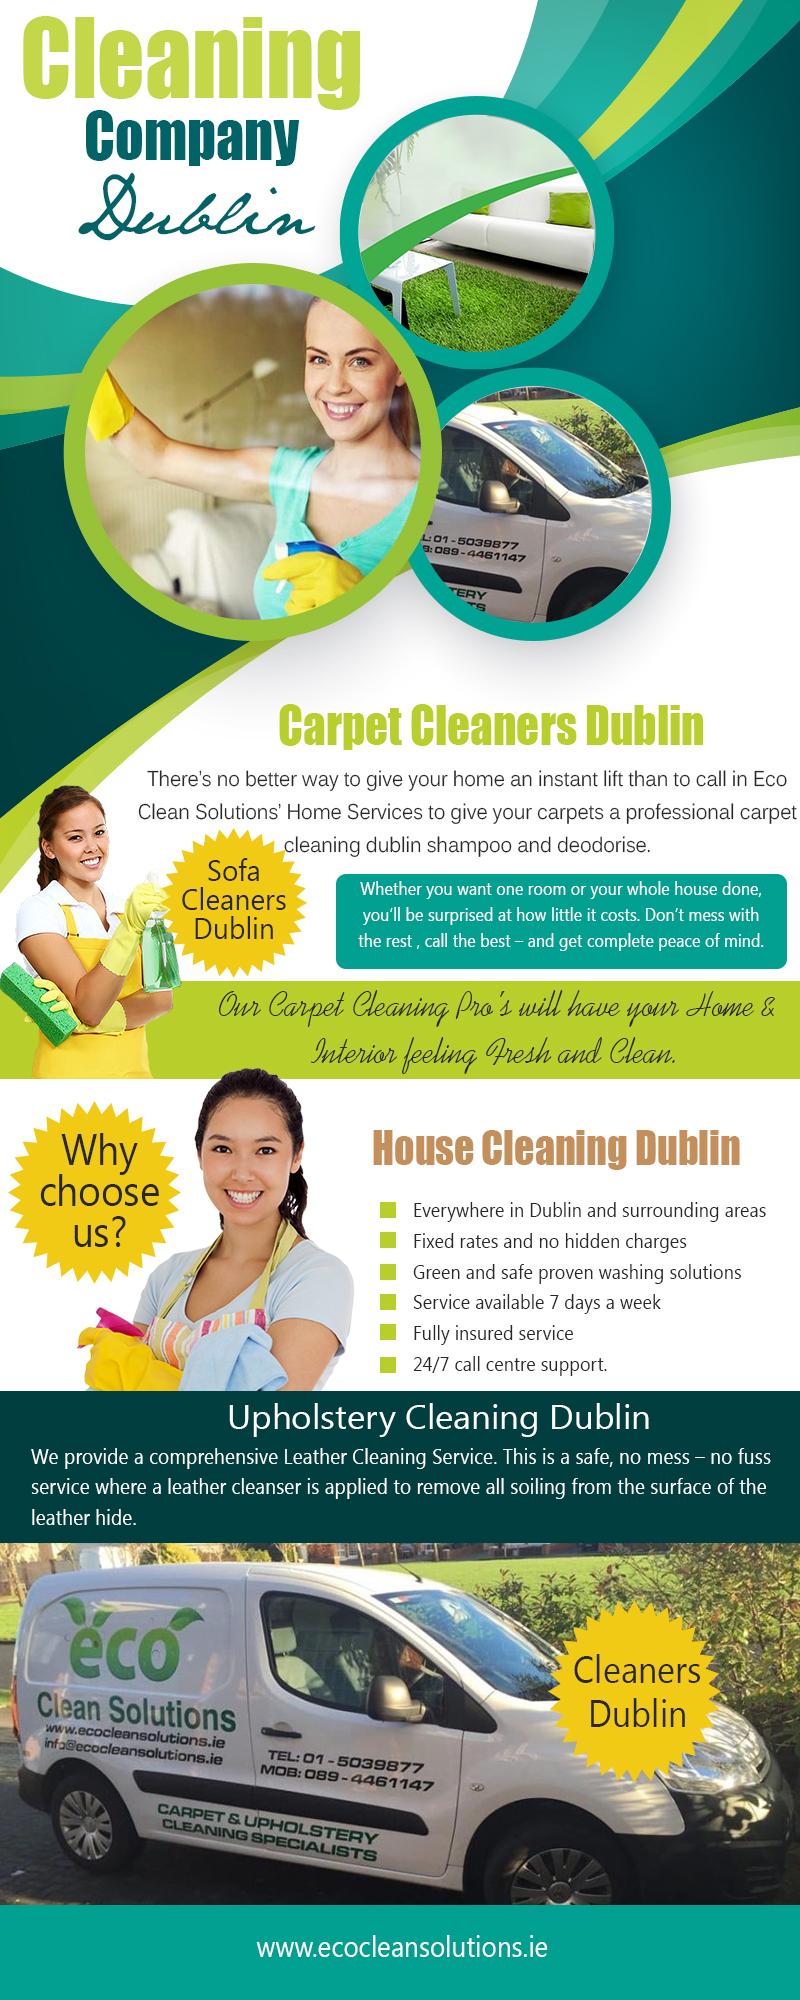 Carpet Cleaners Dublin